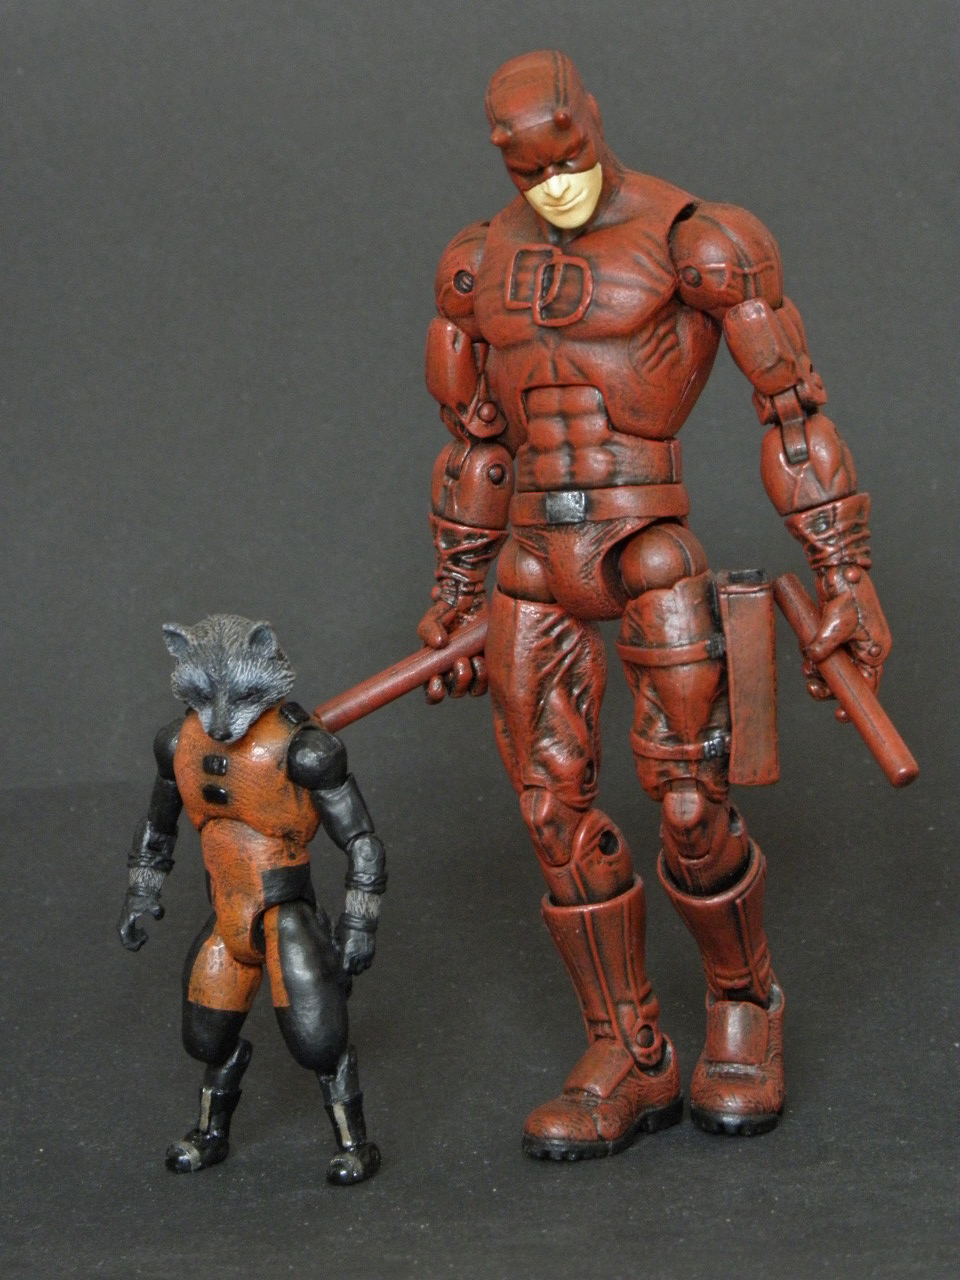 Star Lord And Rocket Raccoon By Timothygreenii On Deviantart: Marvel Legends Rocket Raccoon Redesign Custom 2 By LuXuSik